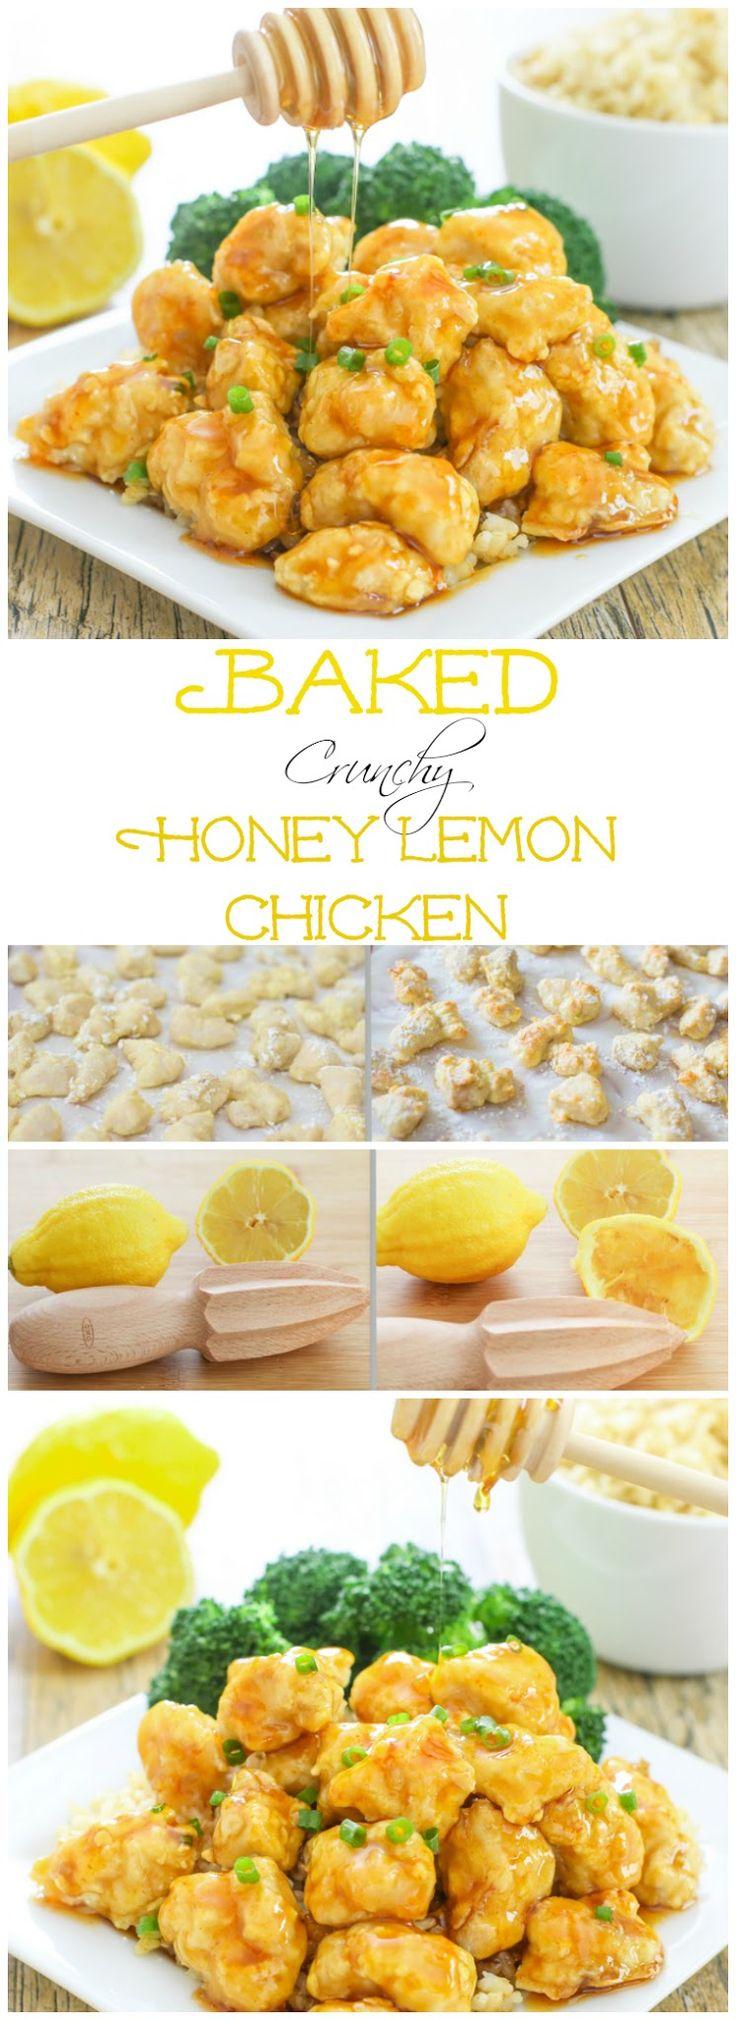 Baked Crunchy Honey Lemon Chicken. No breadcrumbs and gluten-free!